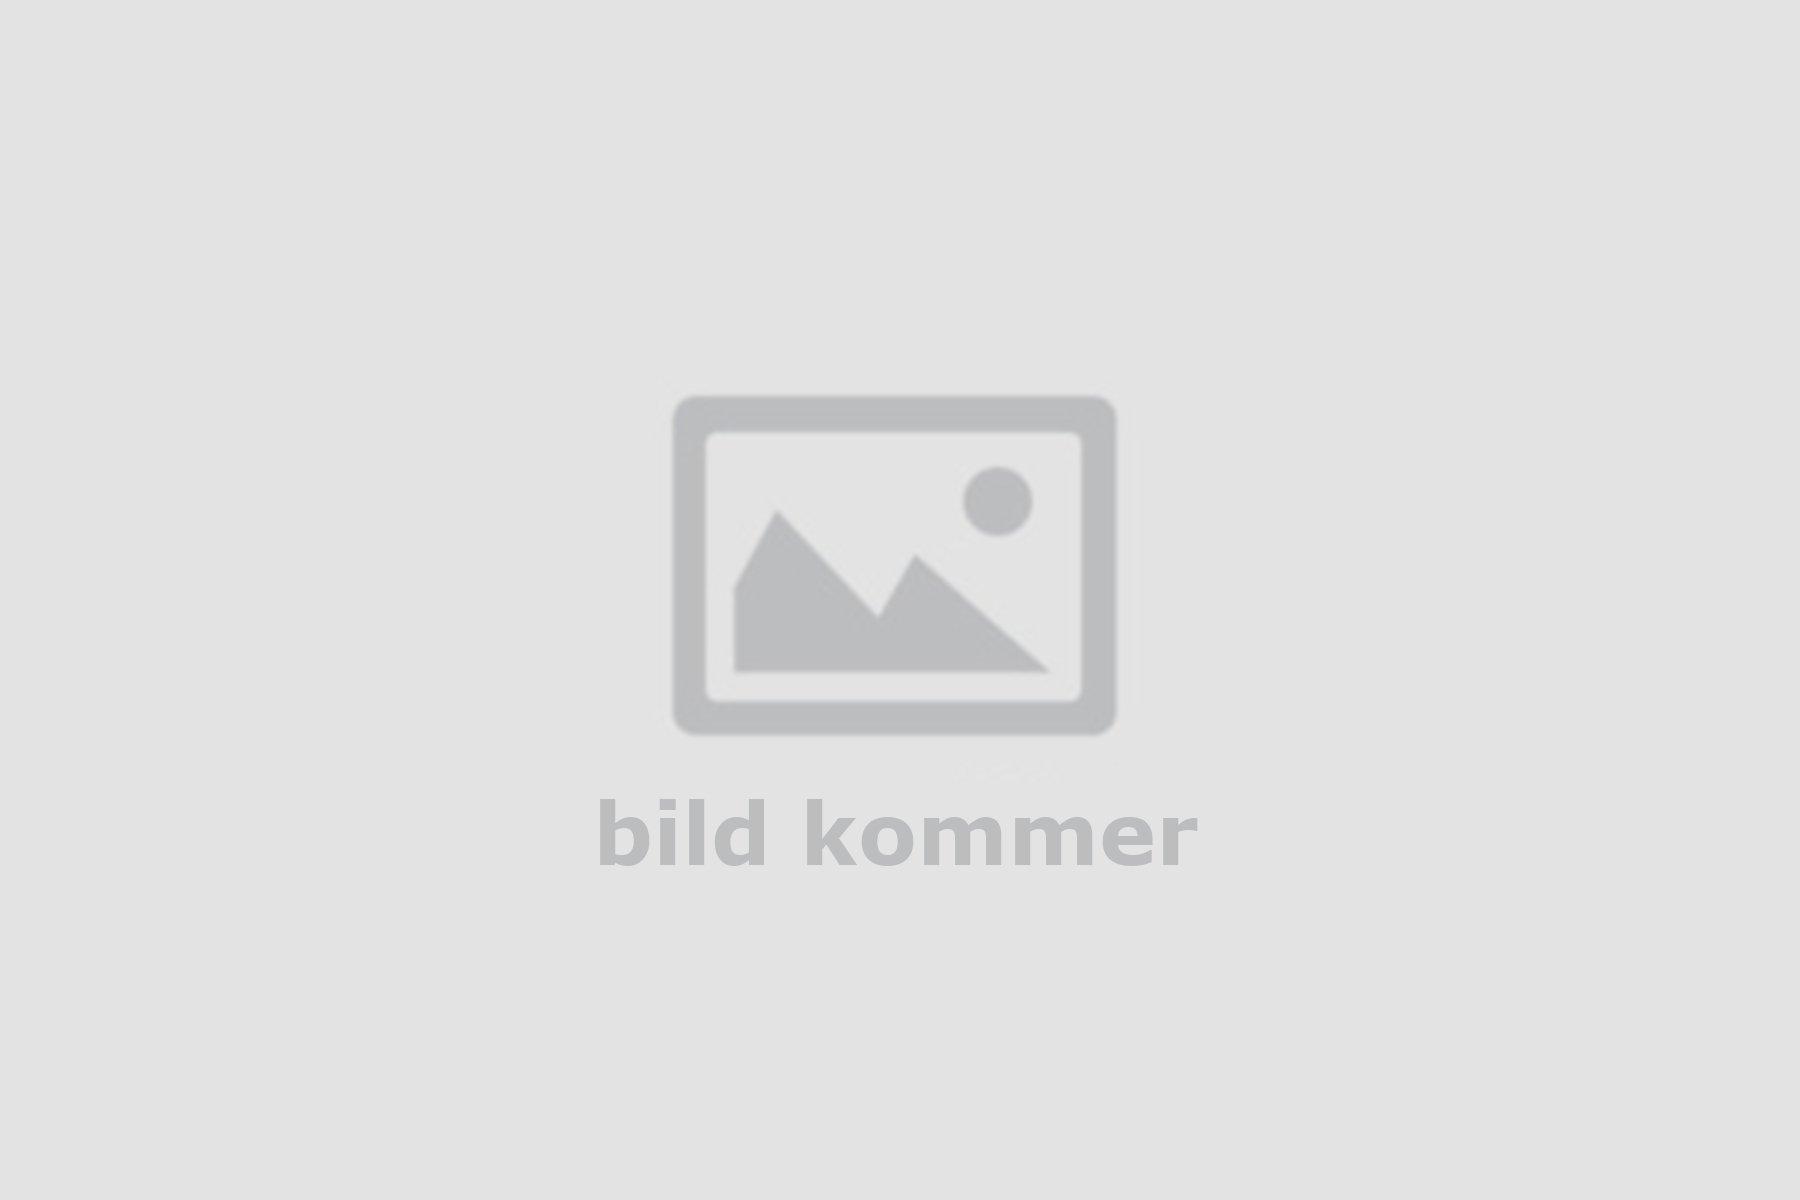 Kalmarkontoret - Maze Advokater